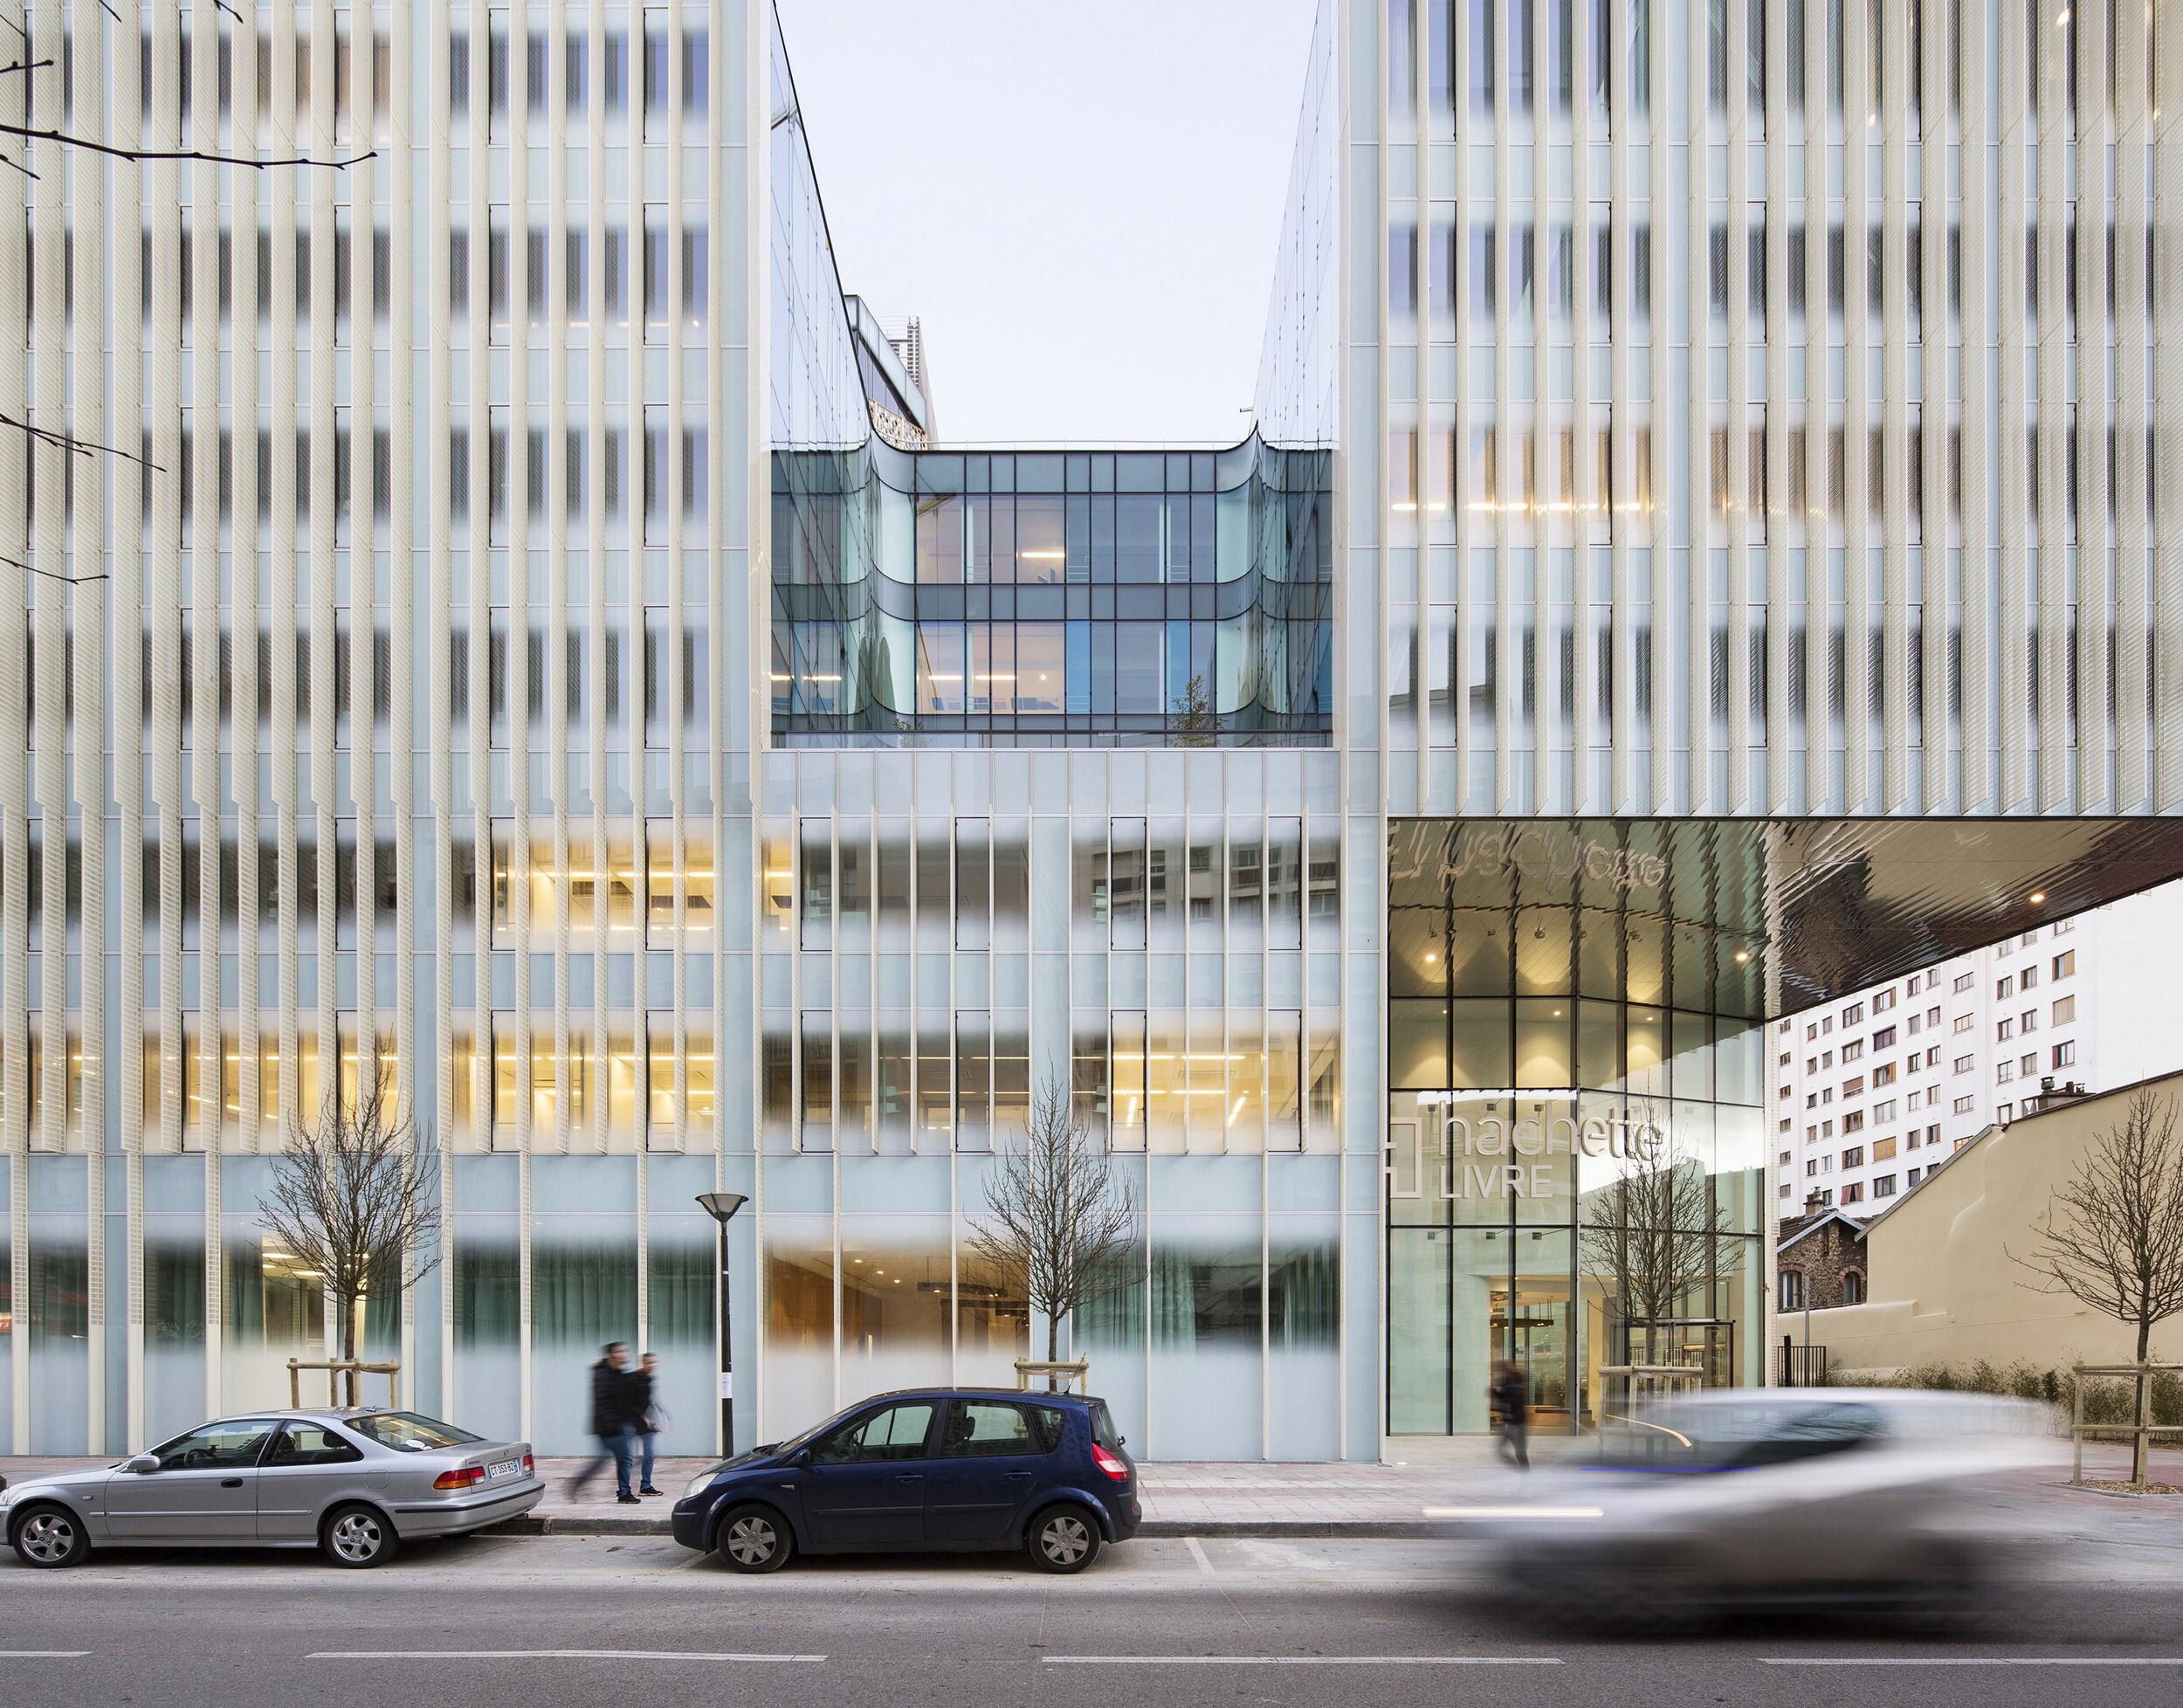 Hachette Livre Headquarters in Vanves